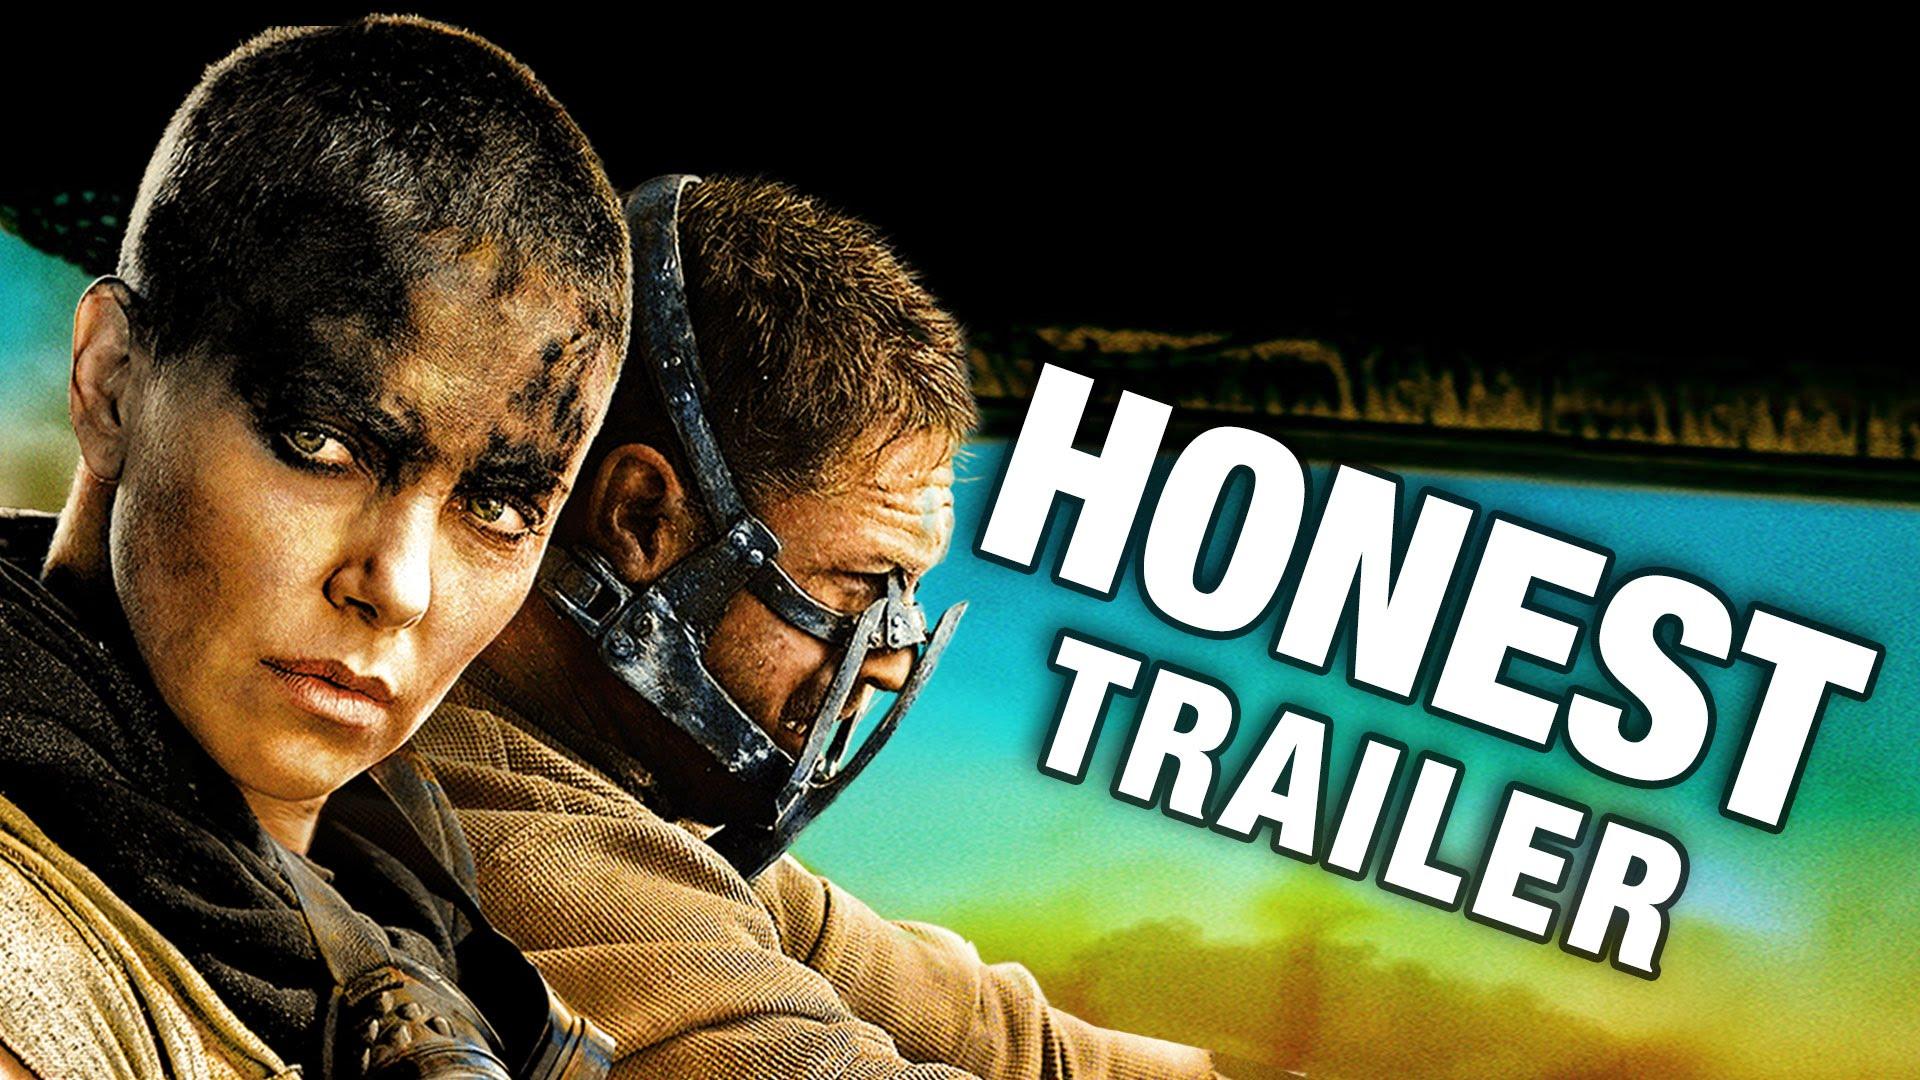 Honest Trailer Mad Max Fury Road Honest Trailers Wikia Fandom